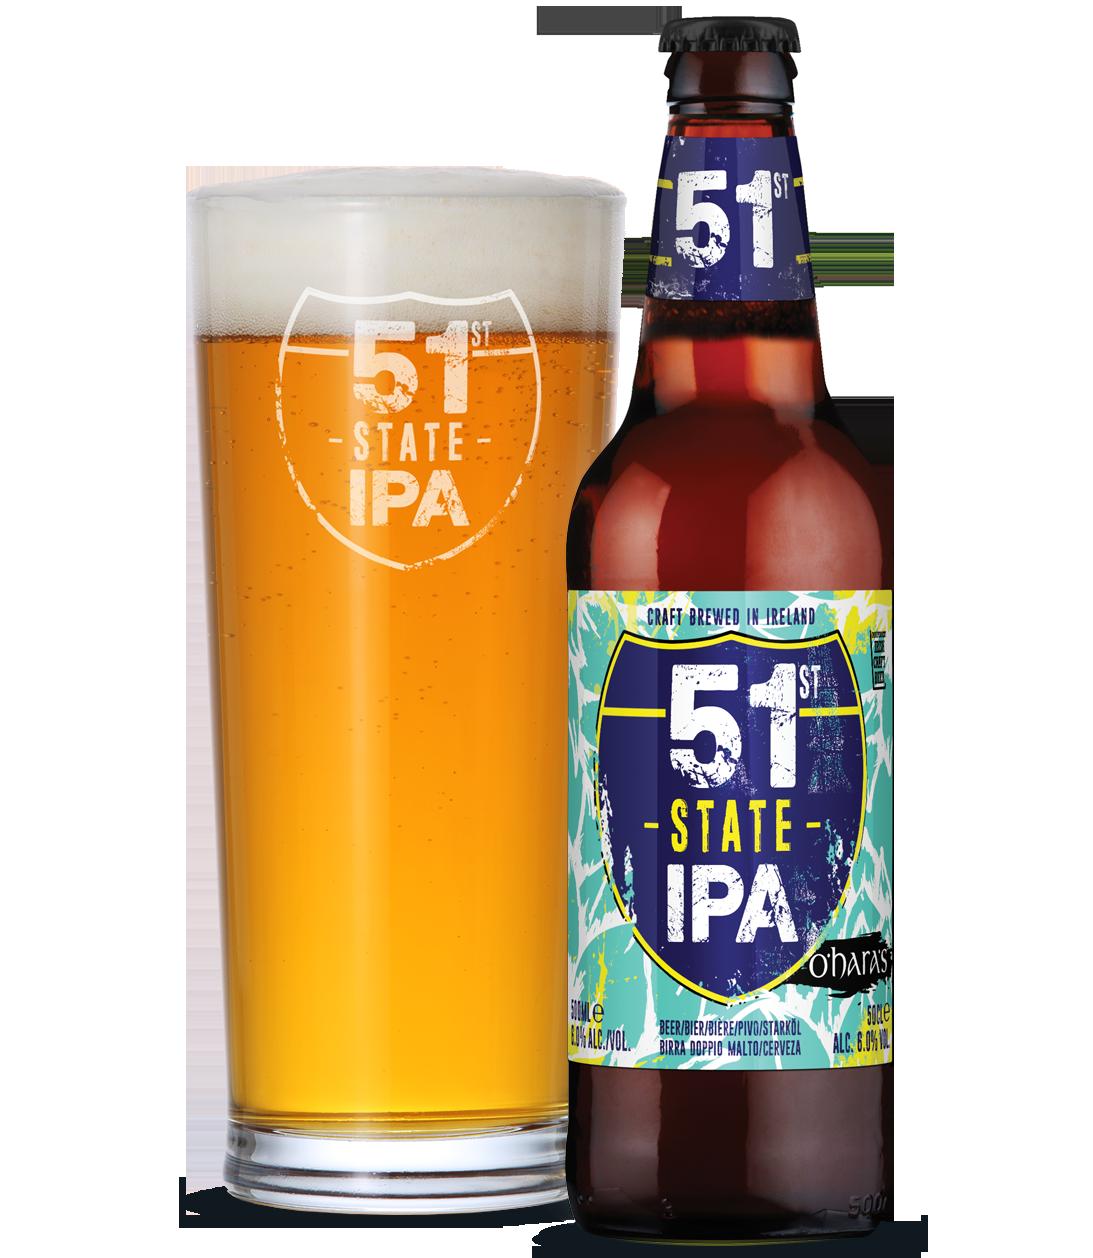 51st State IPA.